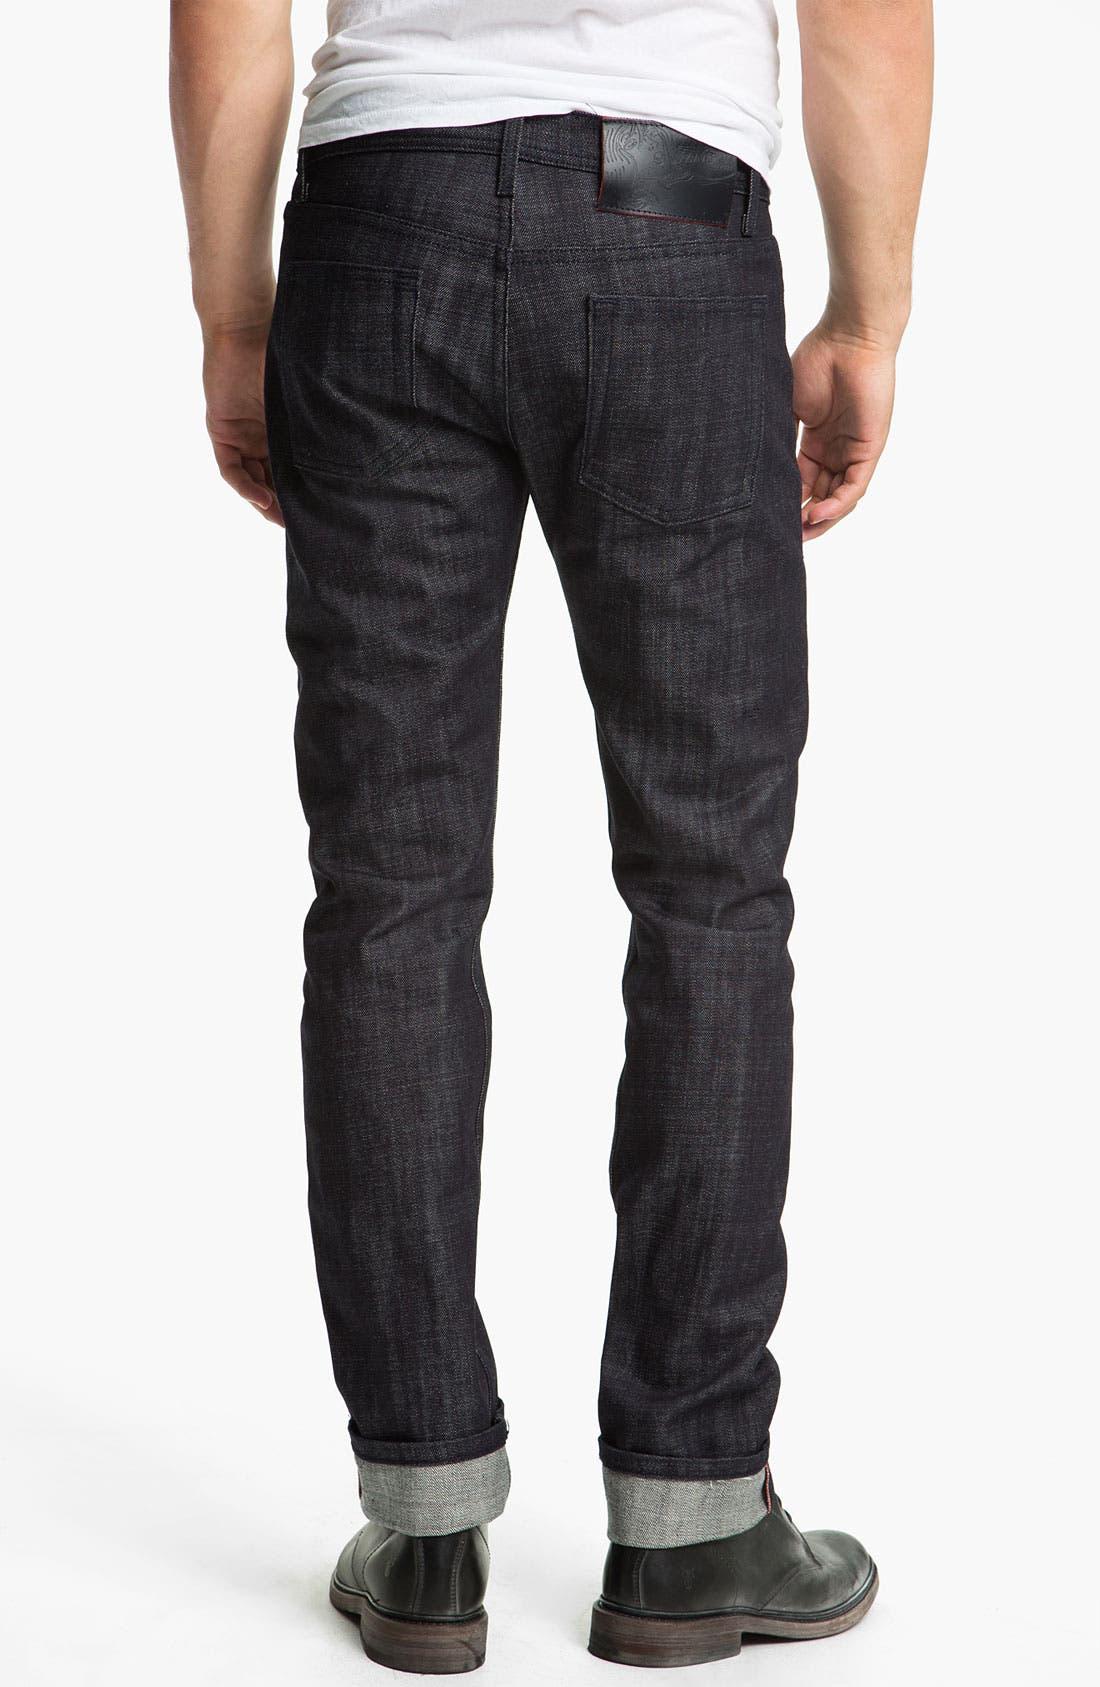 Main Image - Naked & Famous Denim 'Weird Guy' Slim Tapered Leg Red Core Selvedge Jeans (Indigo)